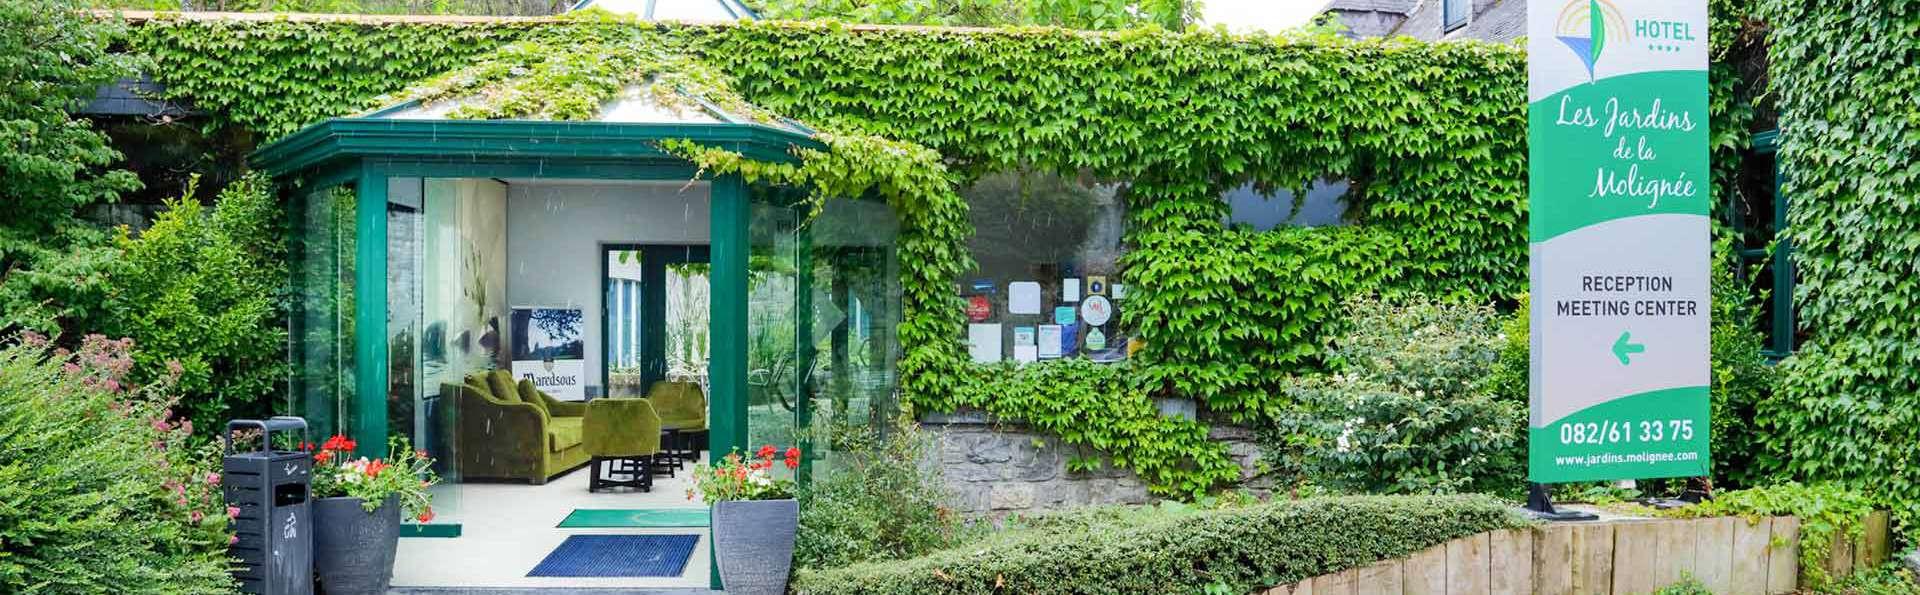 Les Jardins de la Molignée - EDIT_Jardins-Molignee_08.jpg